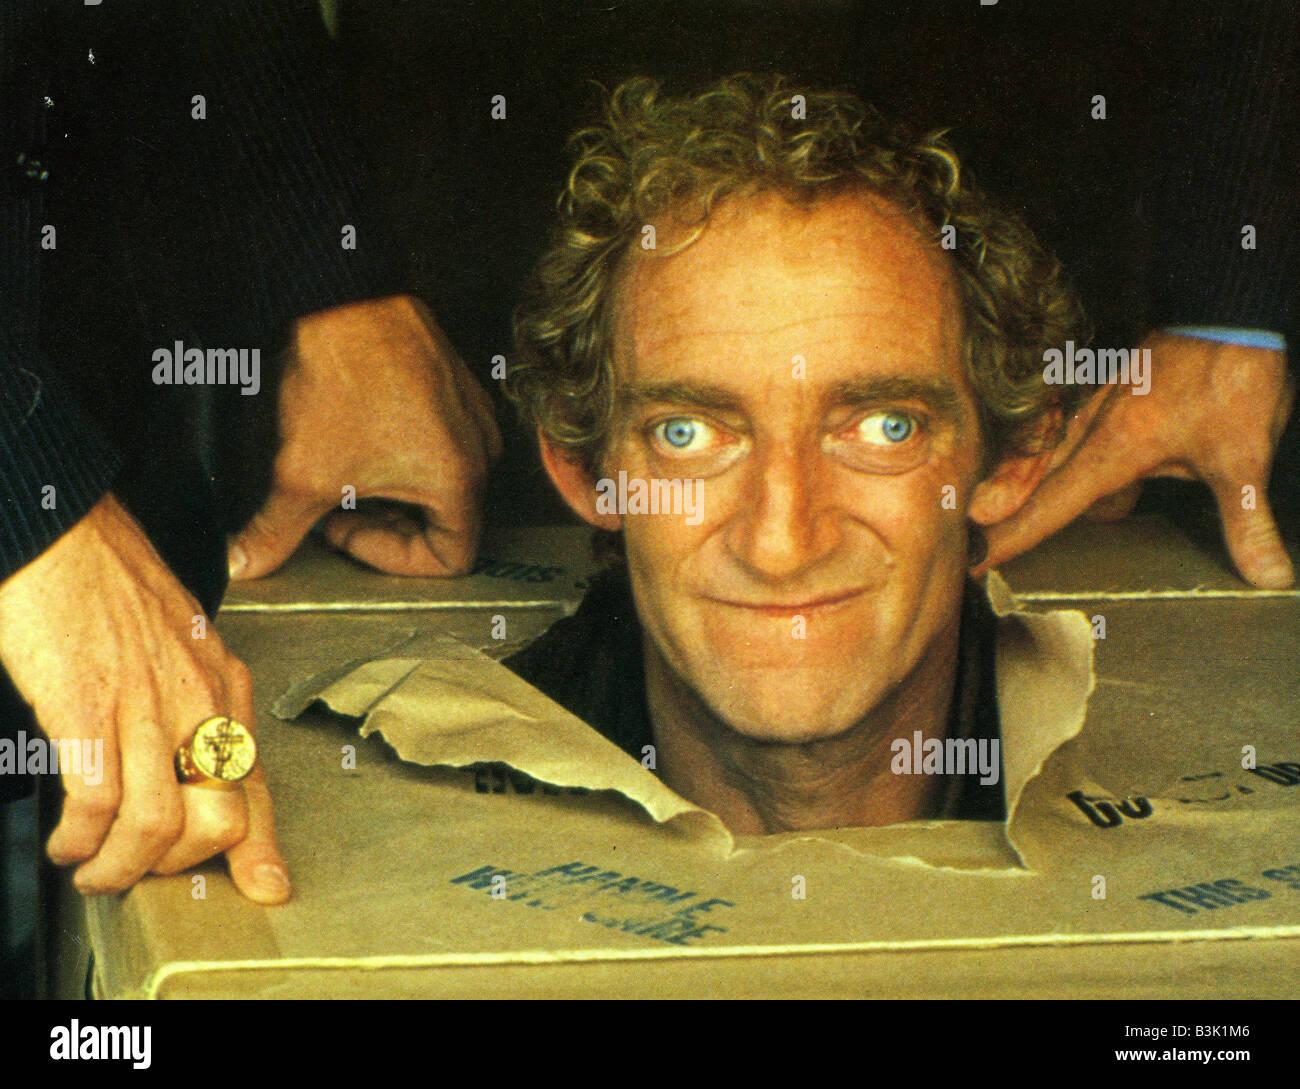 IN Gott film wir Vertrauen 1980 Universal mit Marty Feldman Stockbild